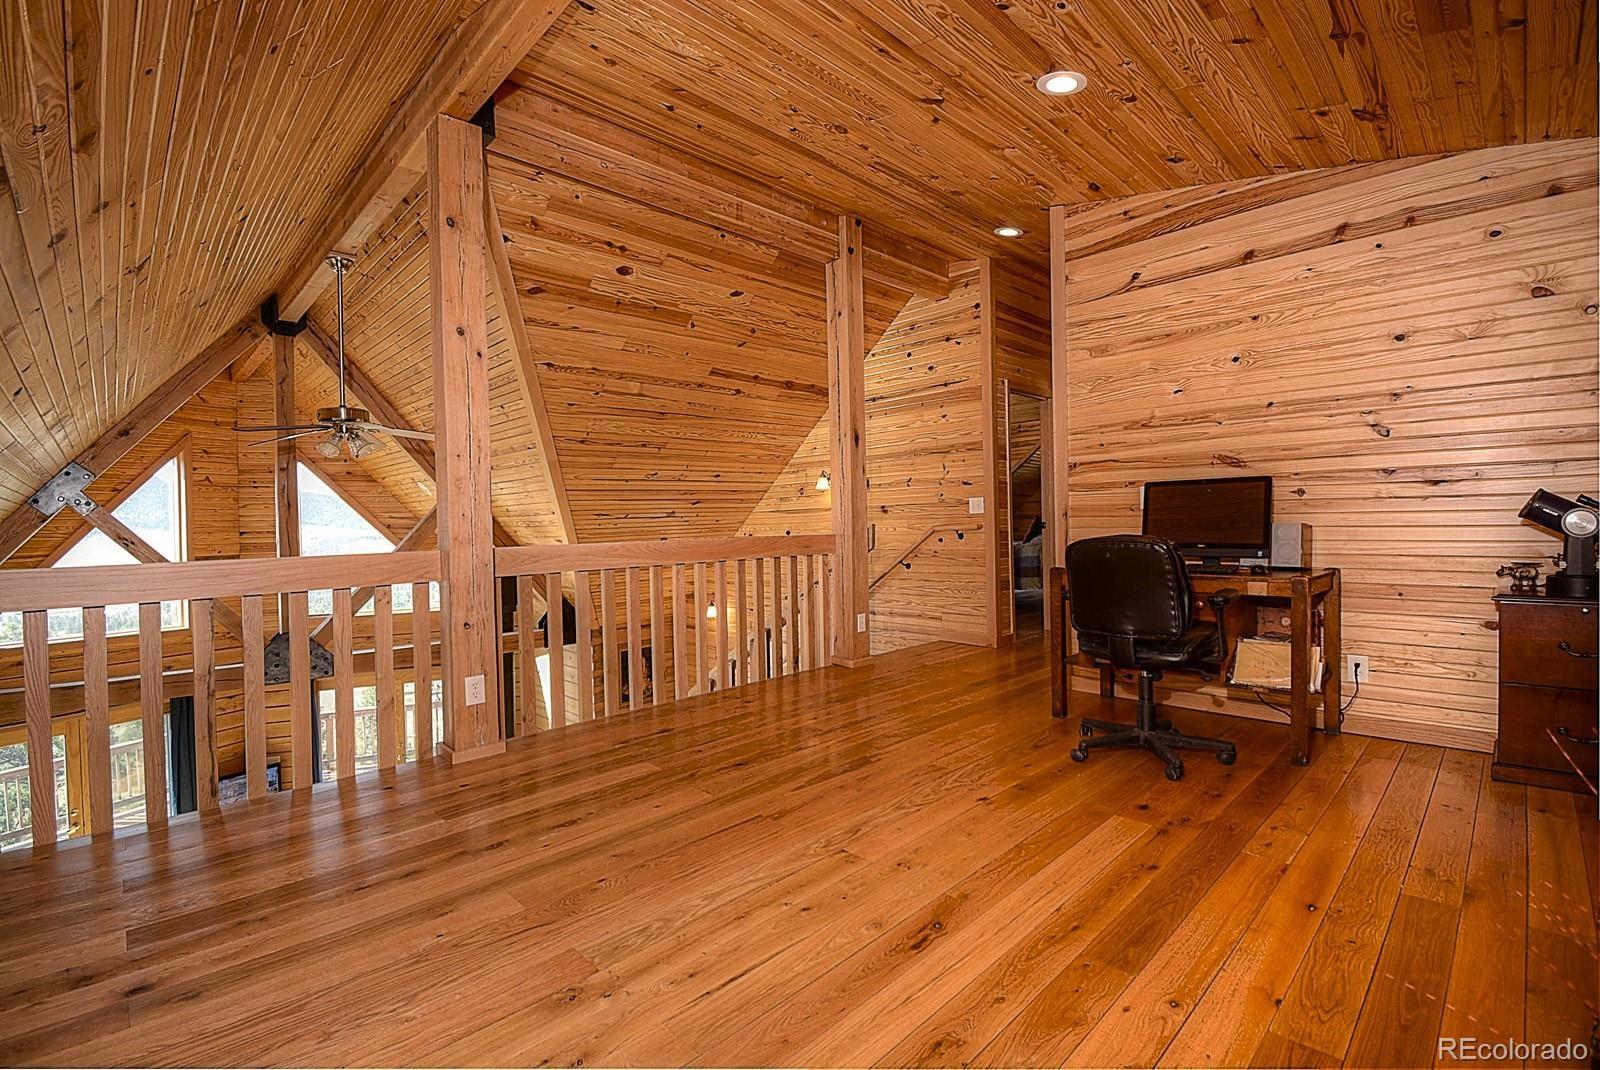 MLS# 8182693 - 20 - 396 Eagle Nest Trail, Guffey, CO 80820